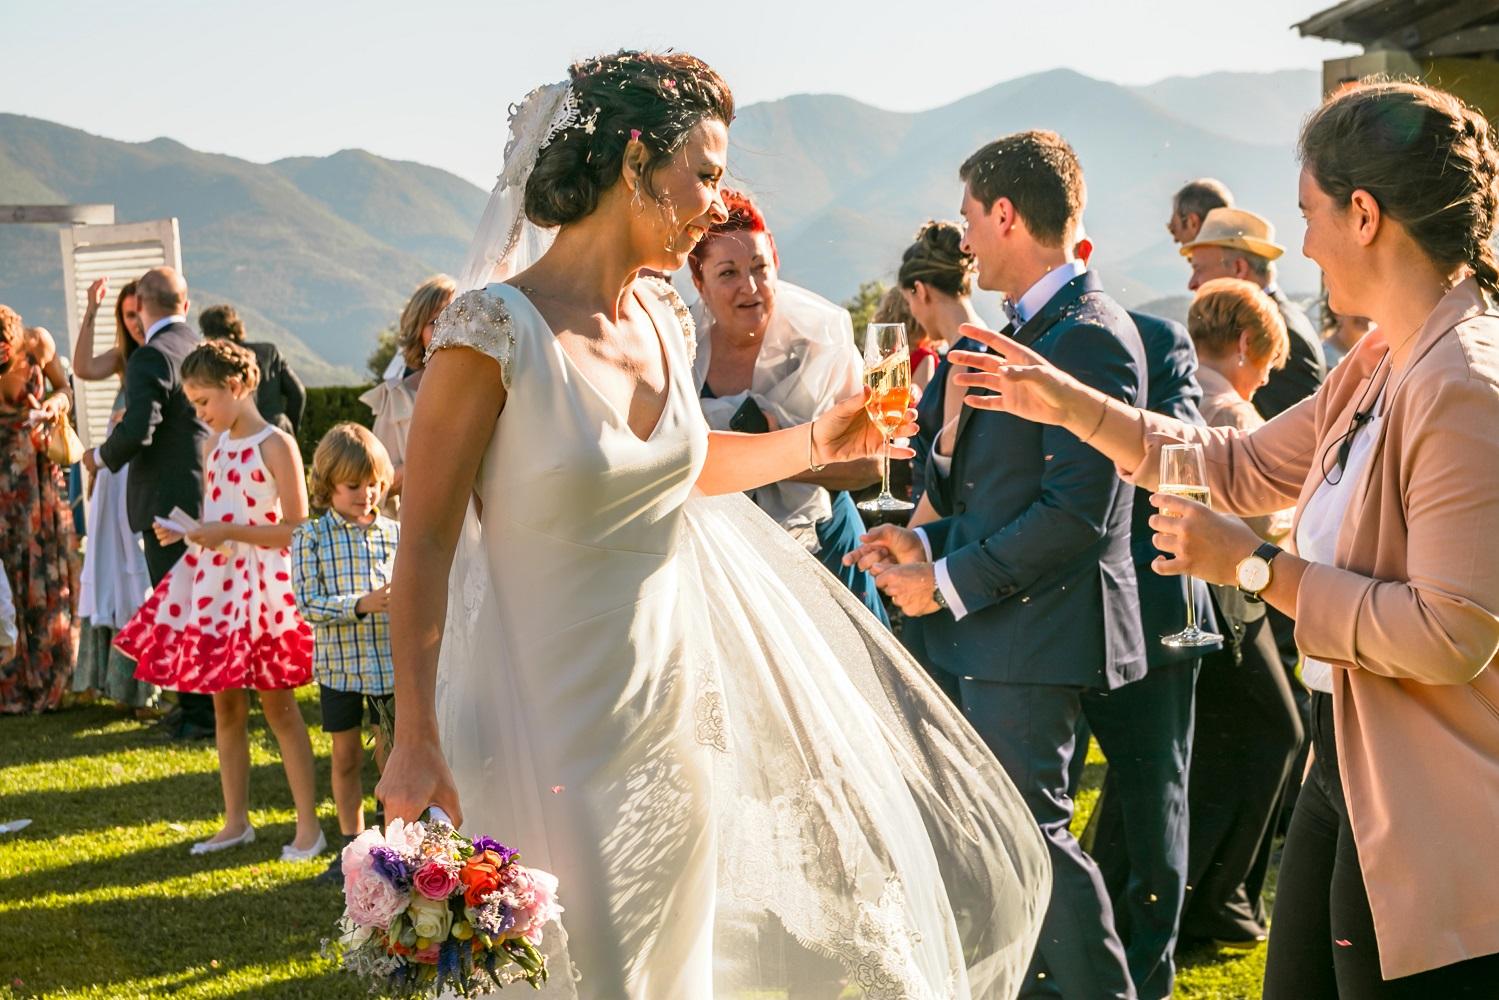 fotografo-de-boda-bodas-net.jpg